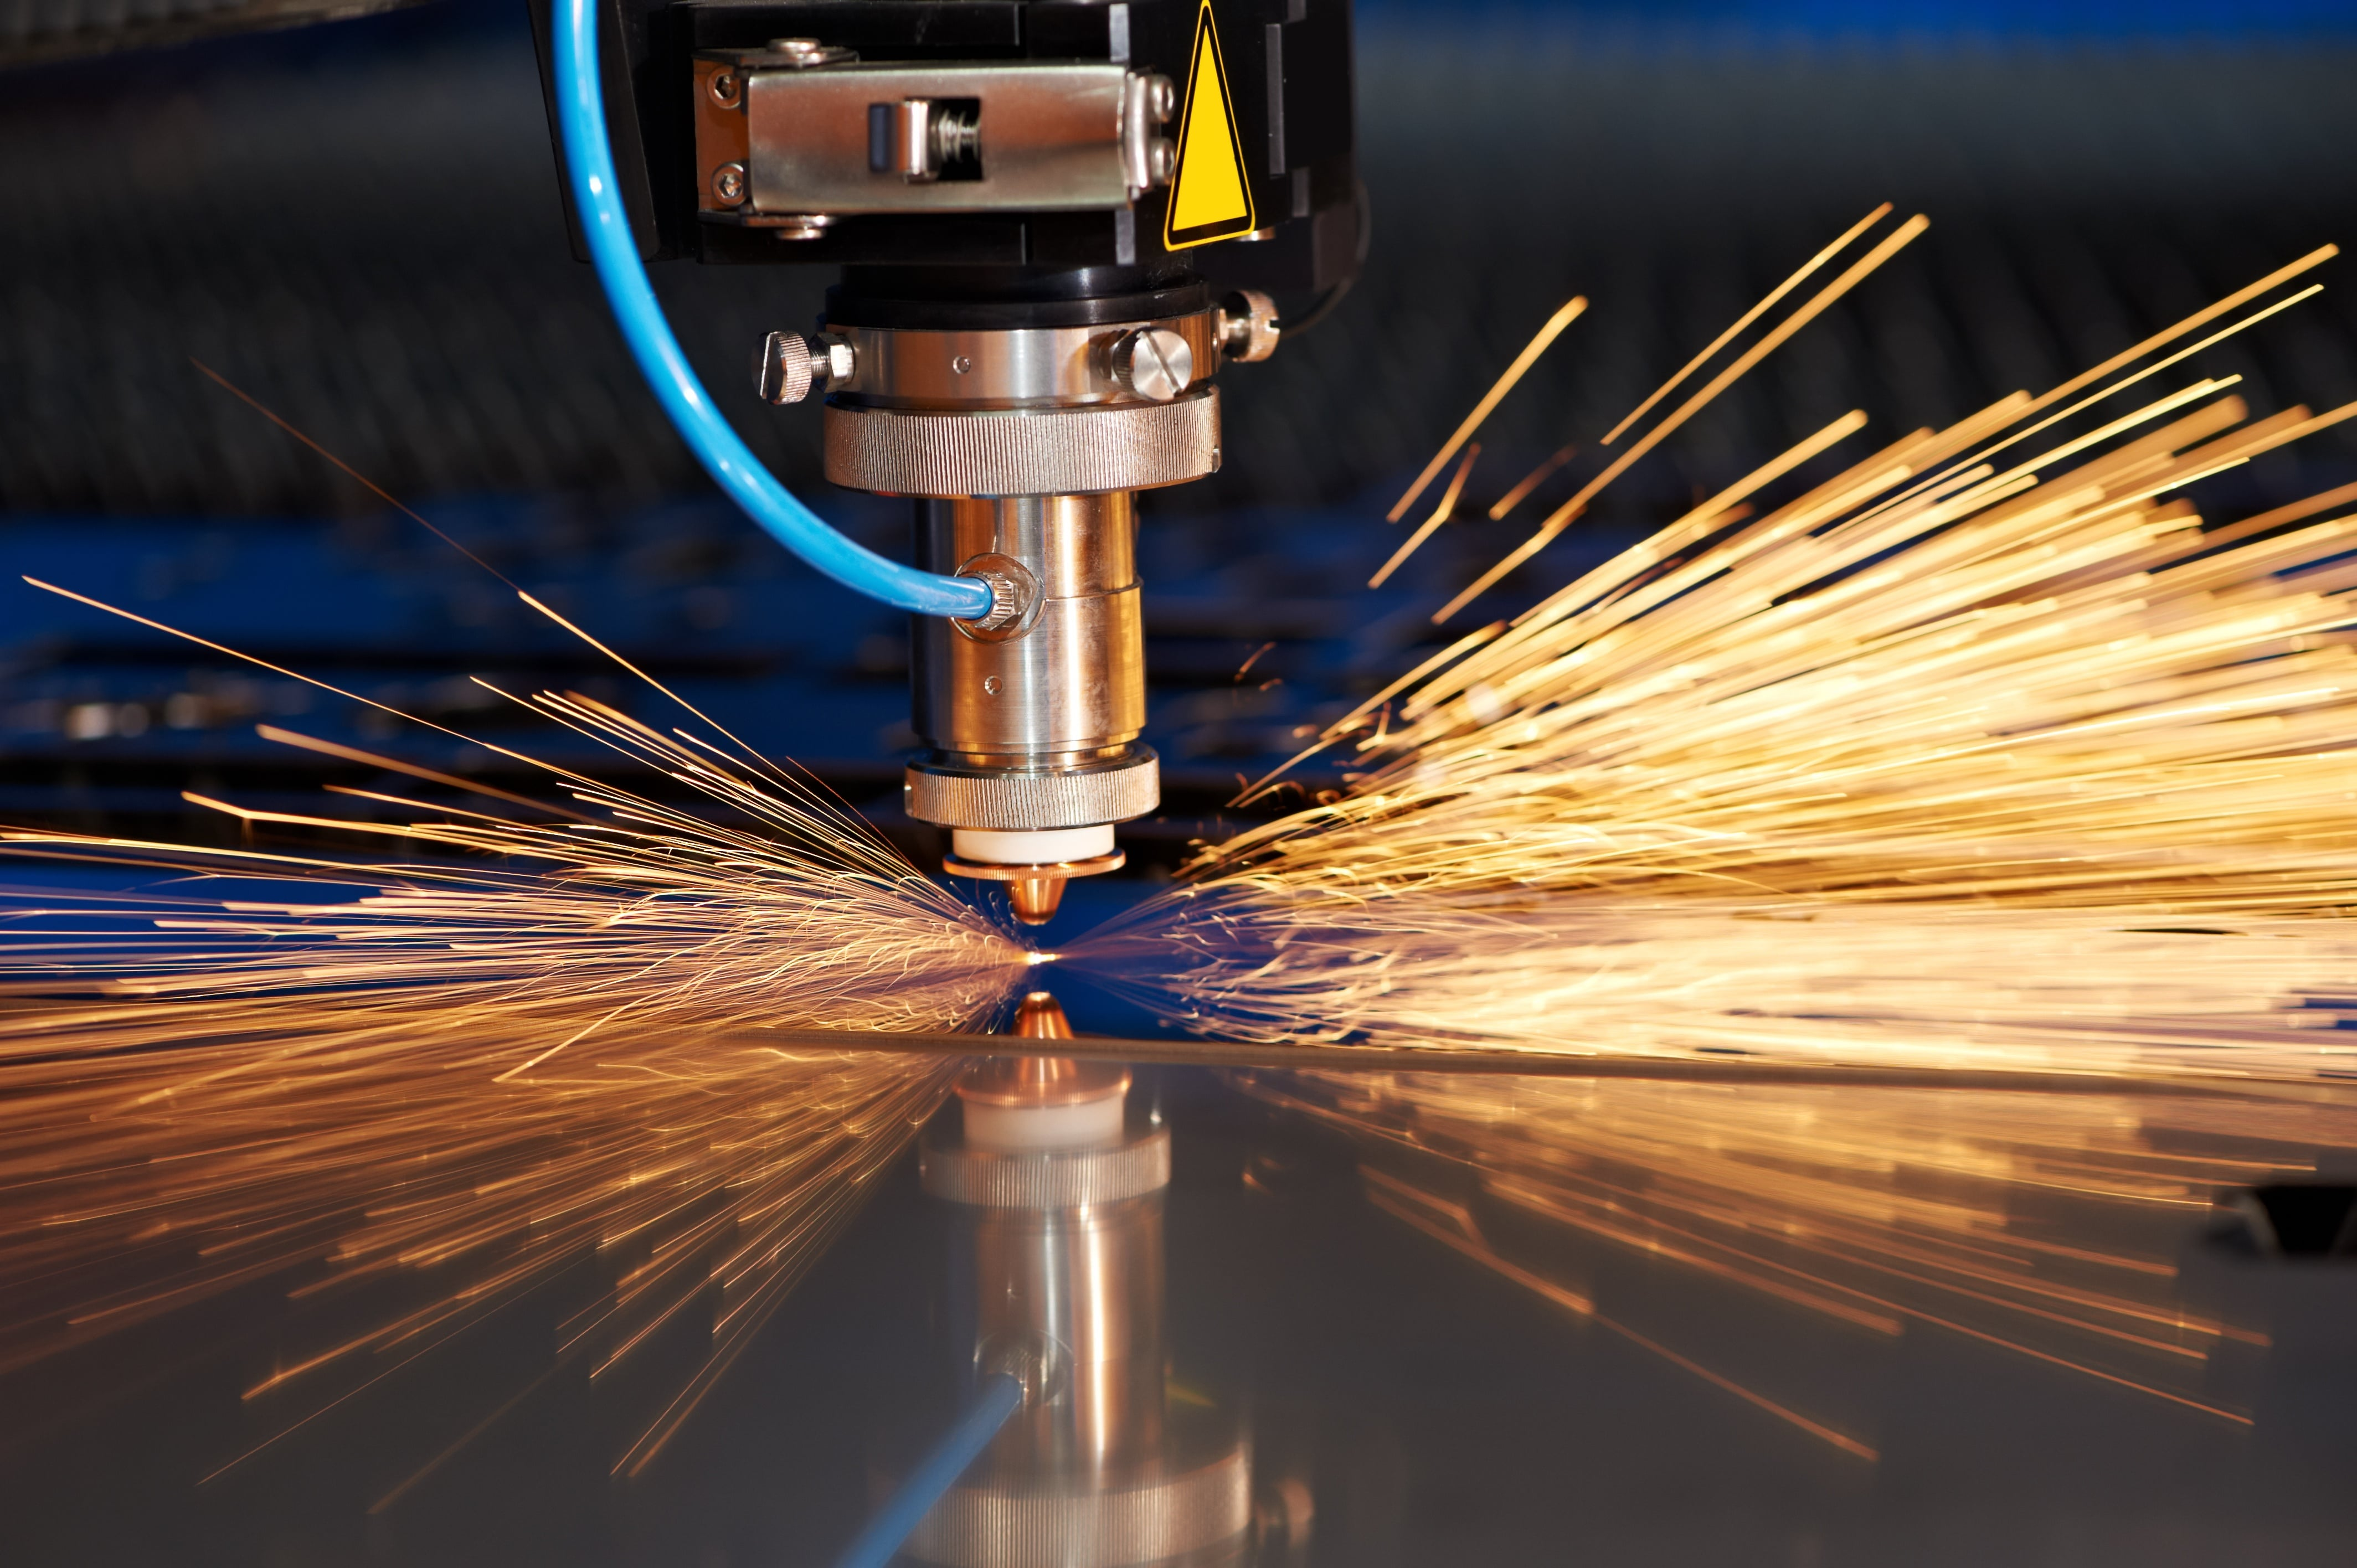 Onde comprar máquina de corte a plasma?